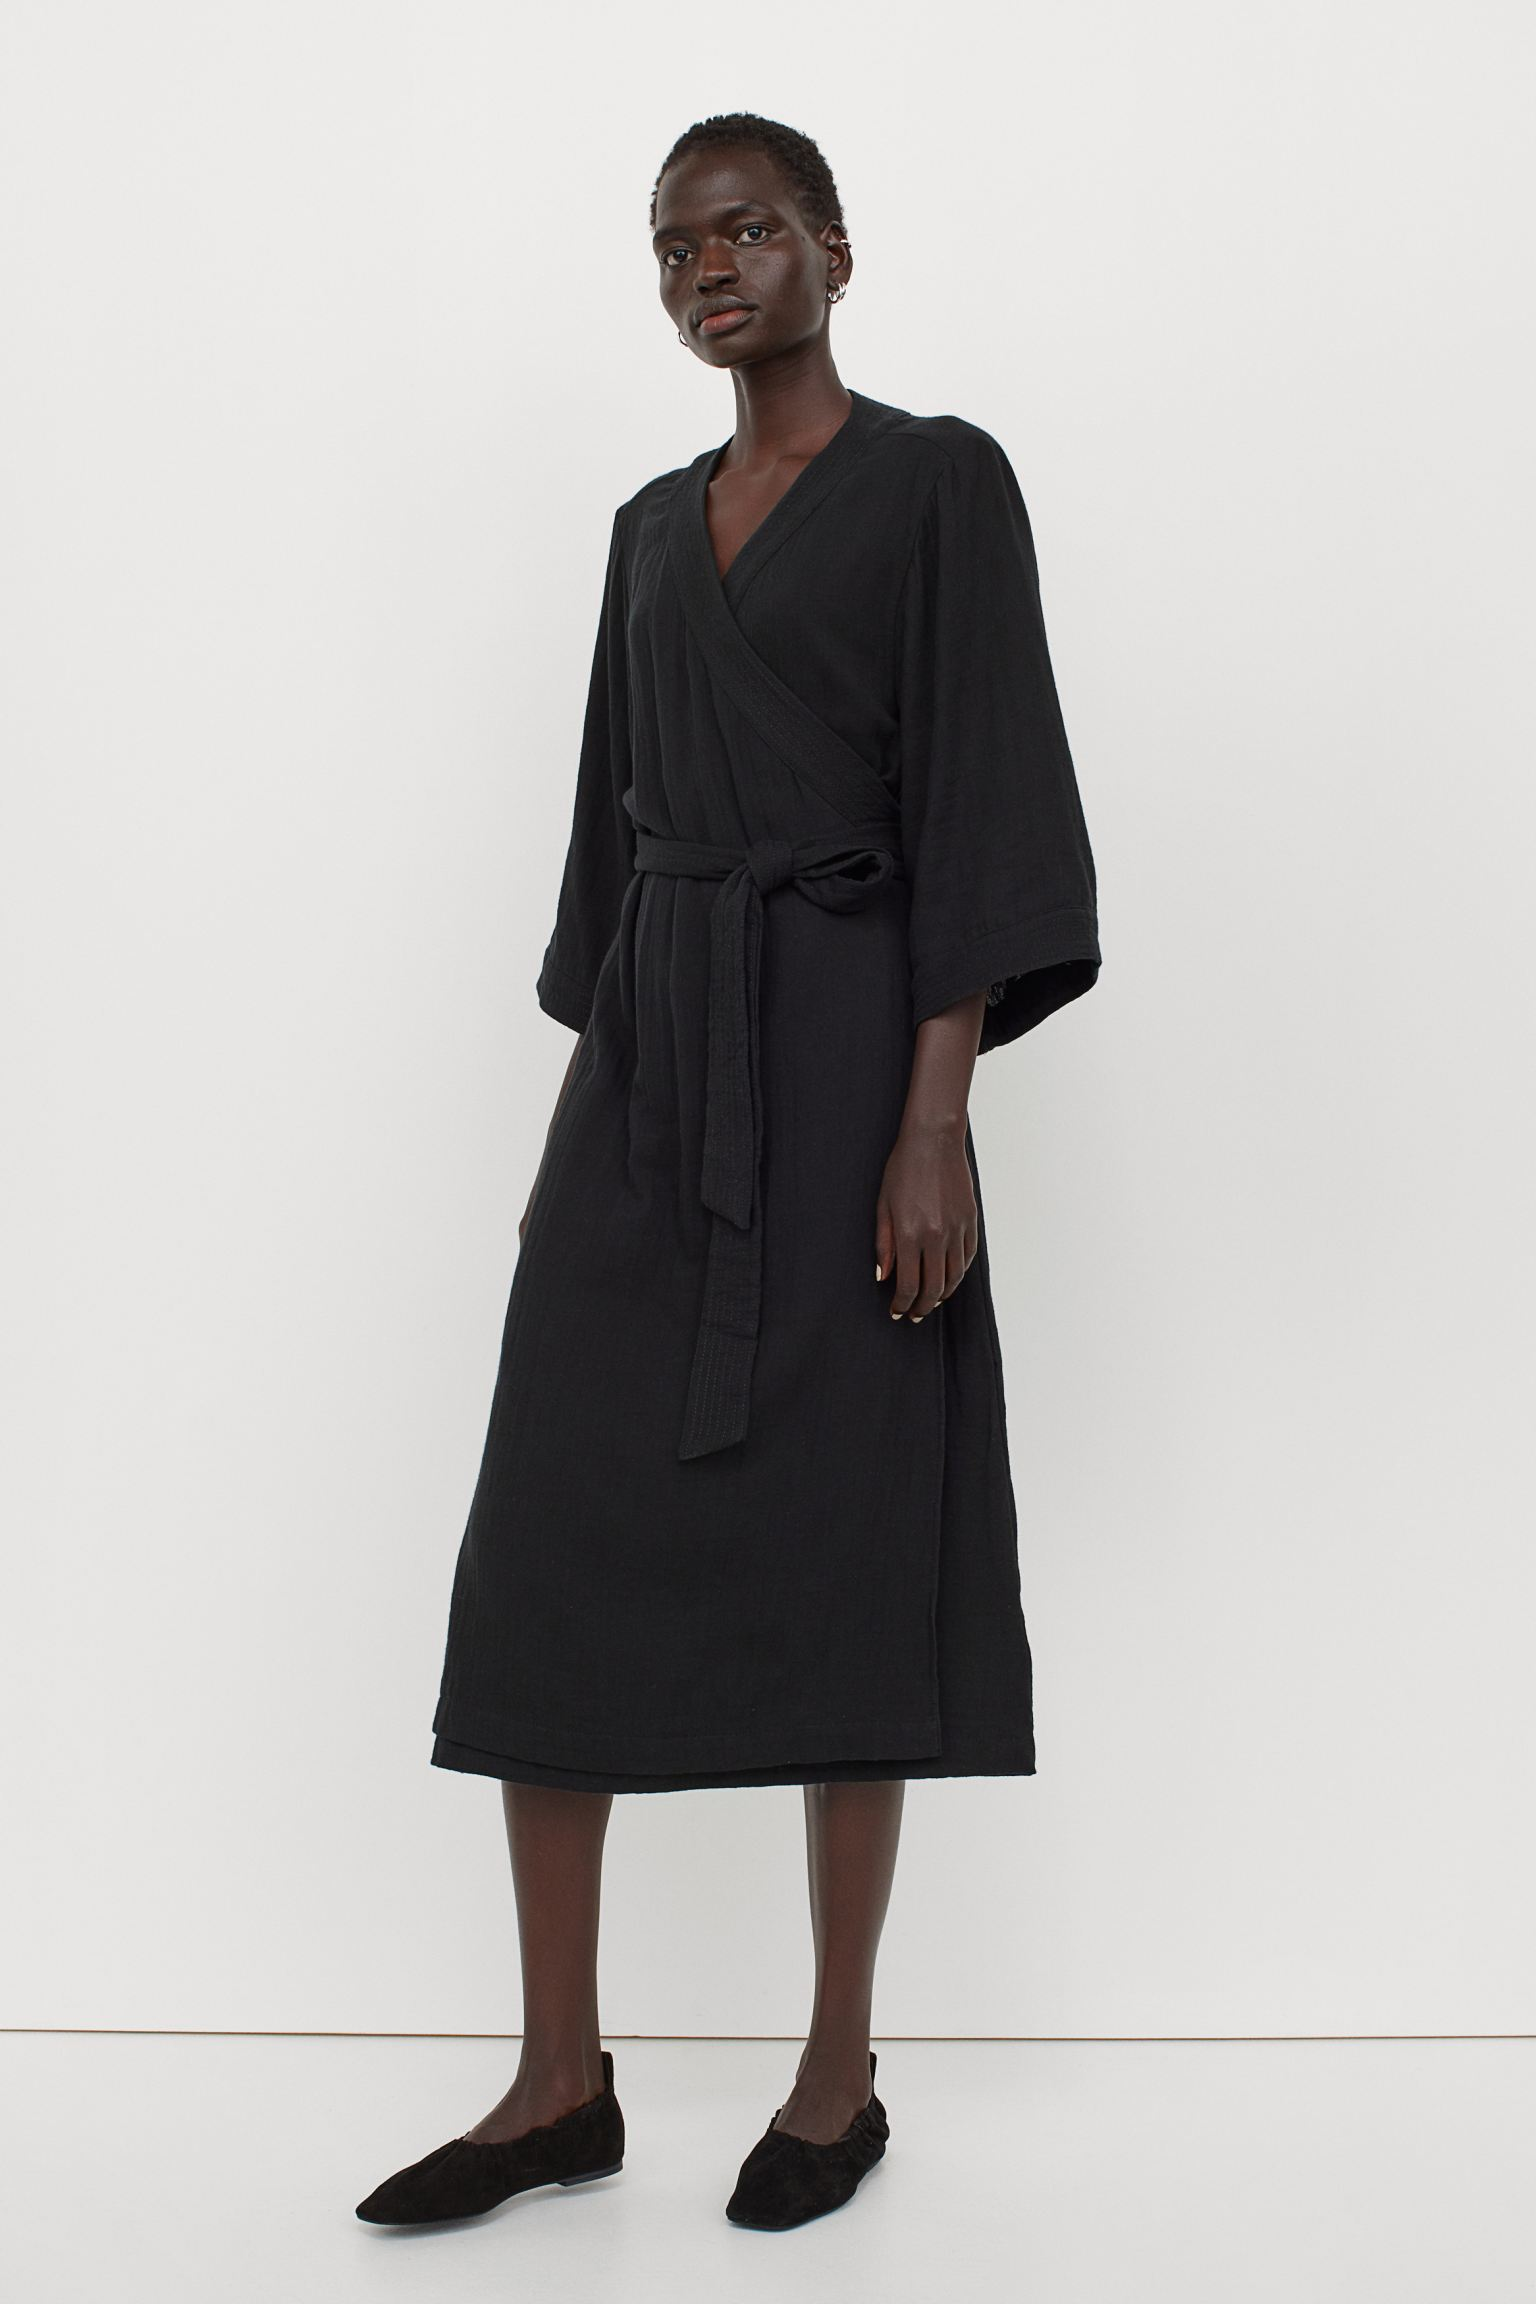 Vestido midi en tejido vaporoso de algodón con manga tres cuartos